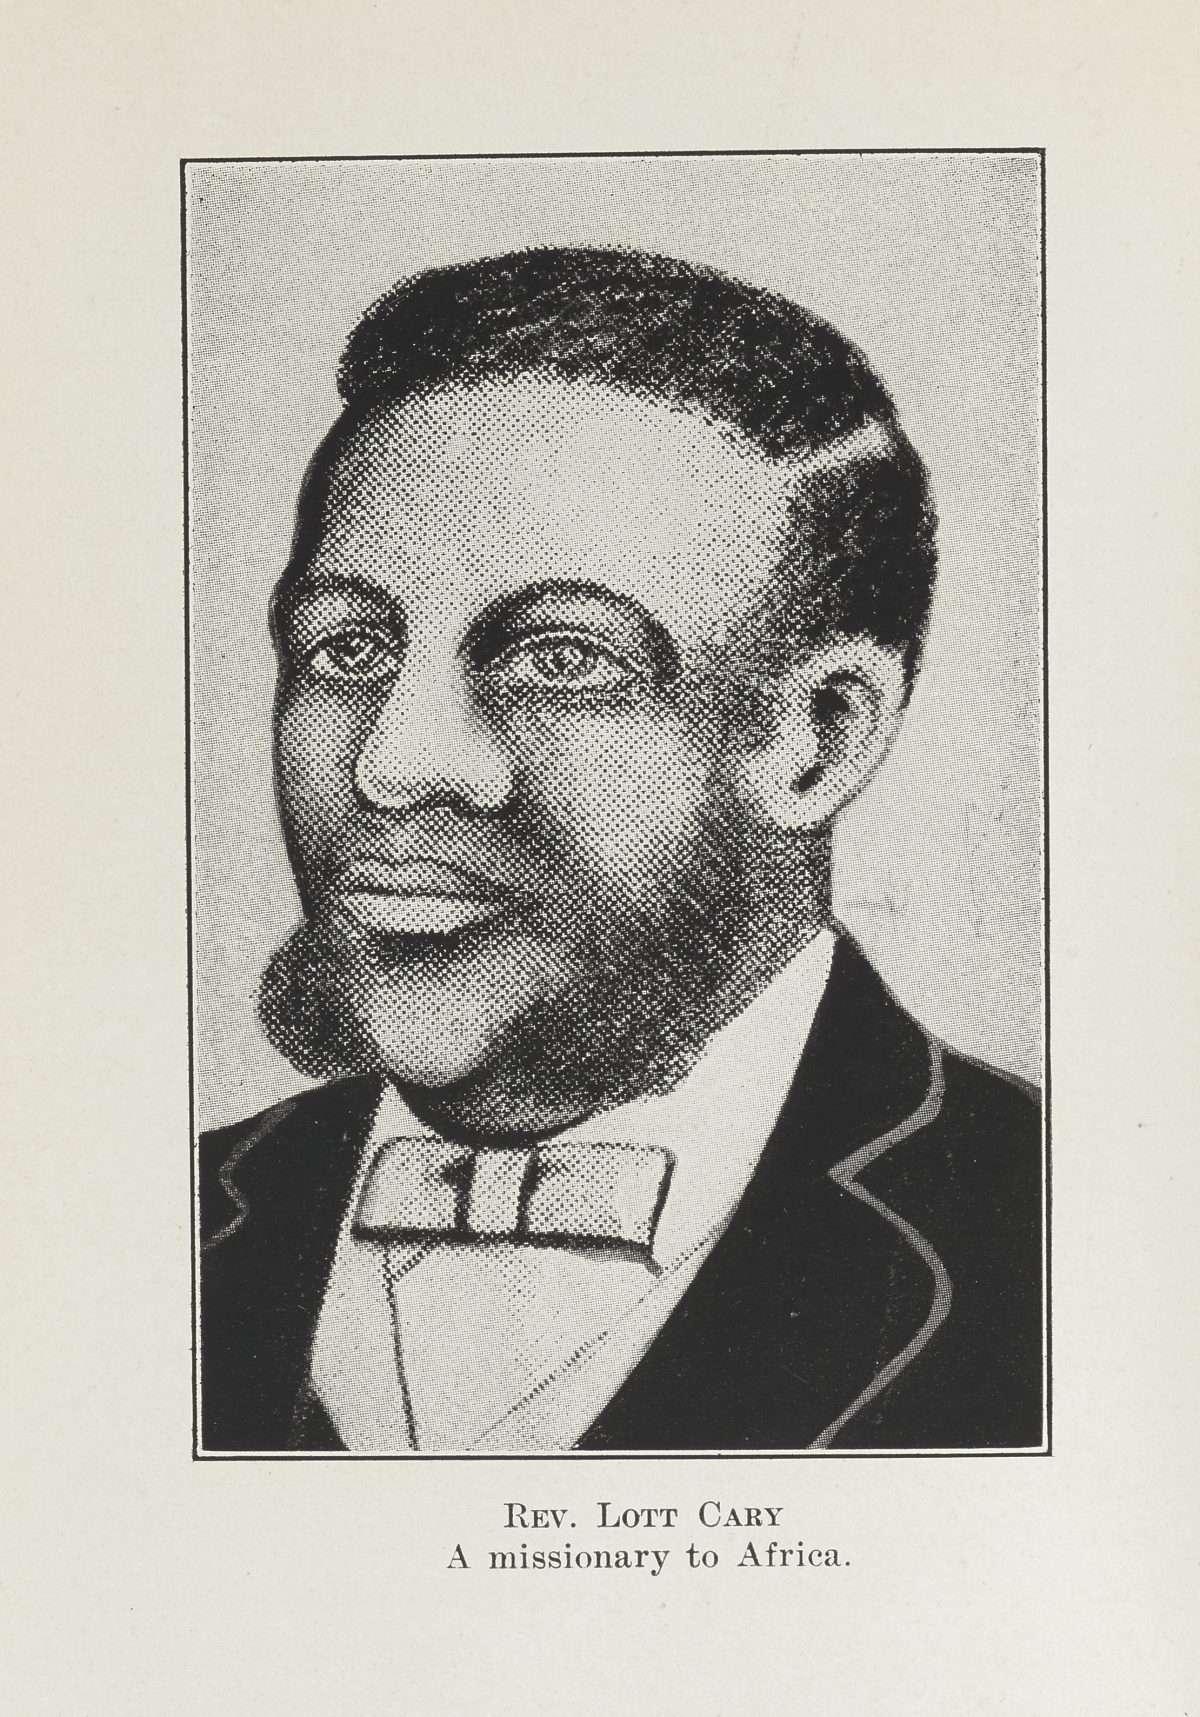 Rev. Lott Cary